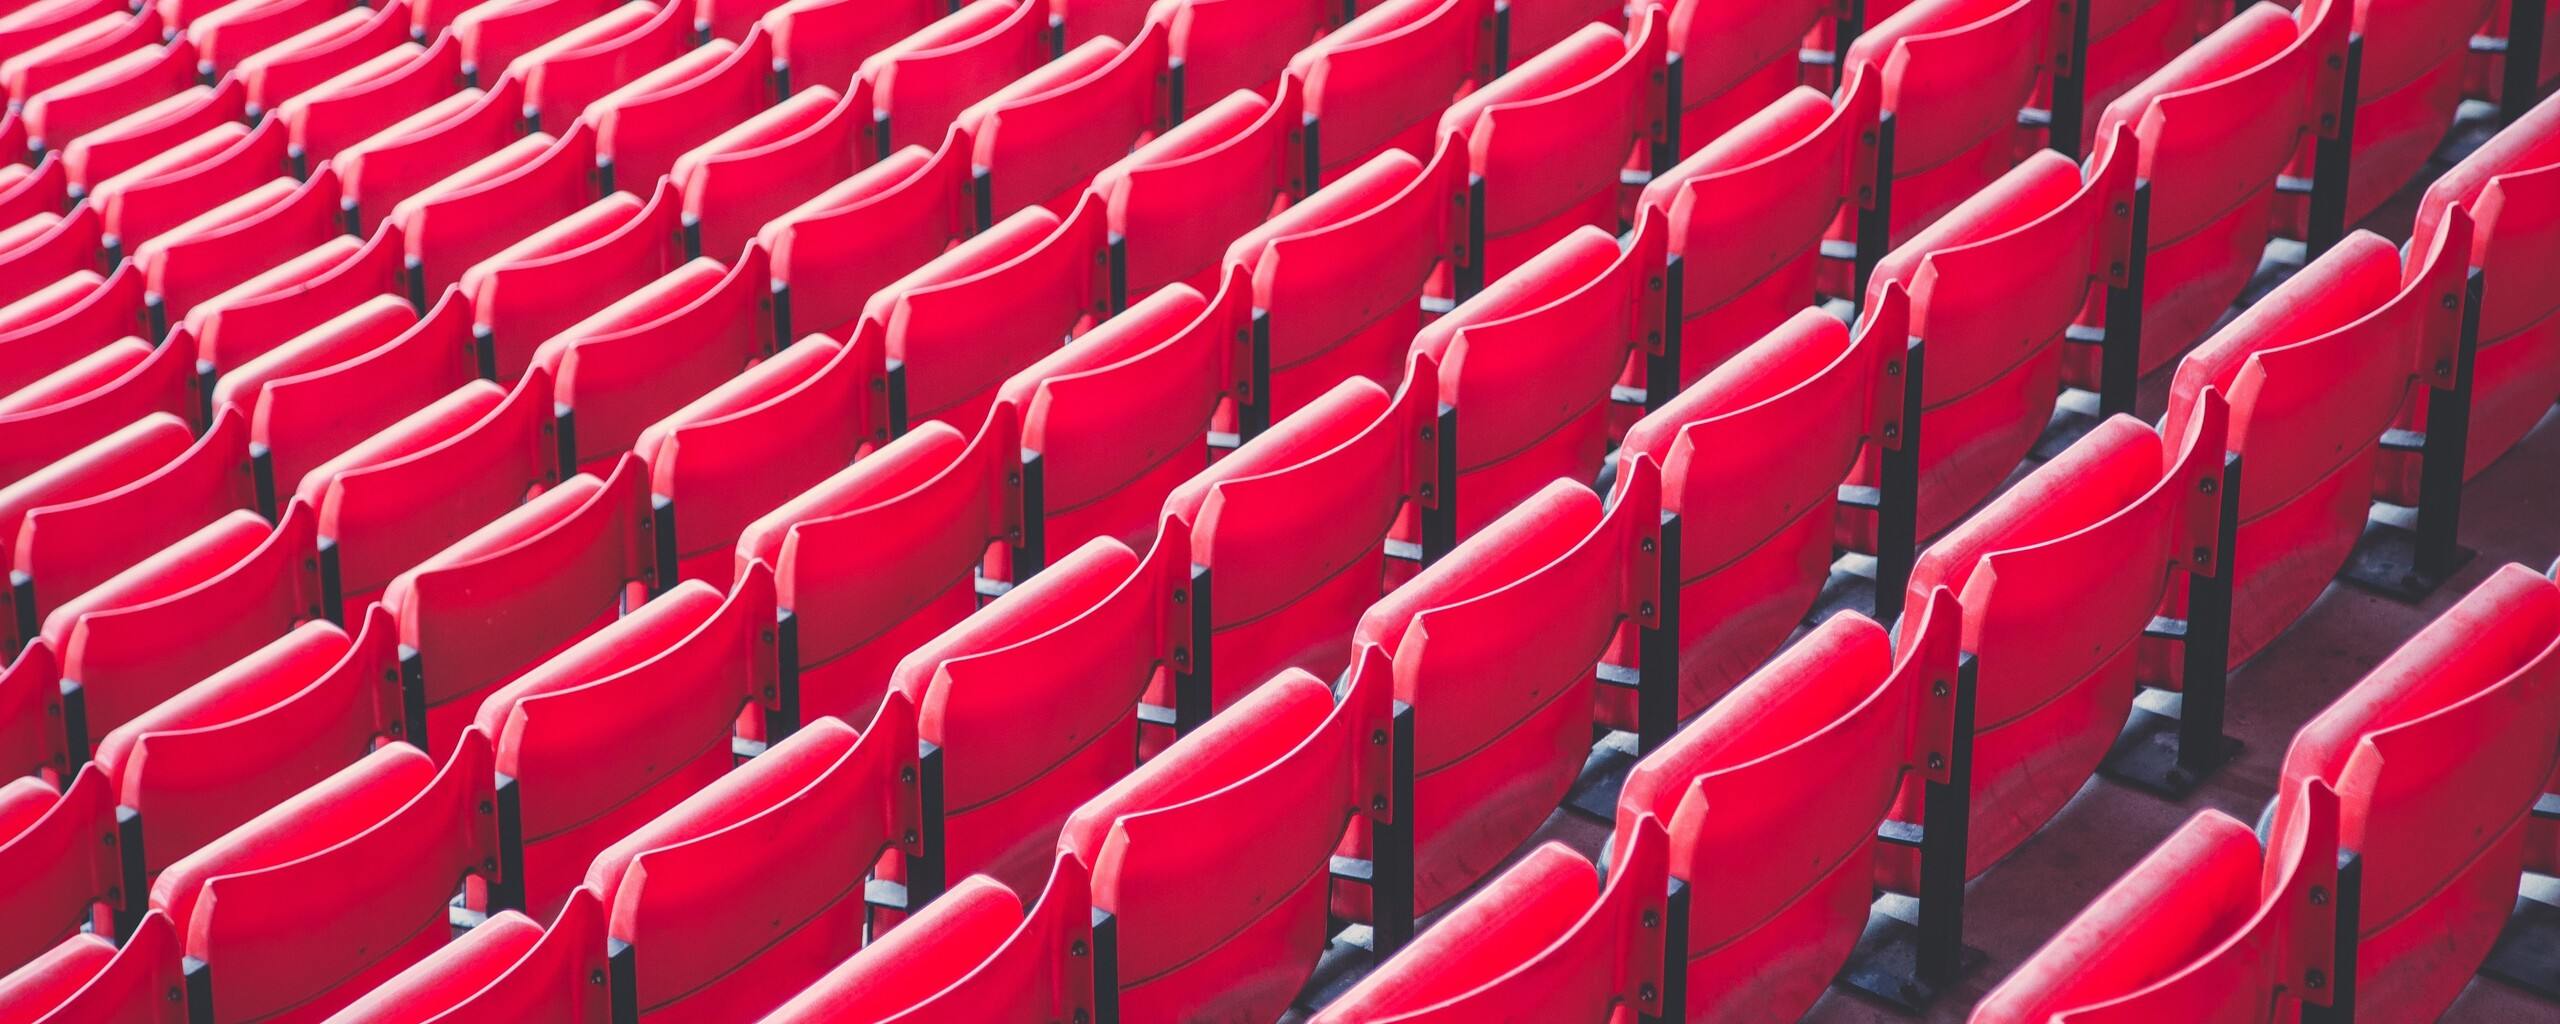 red-chairs-pattern-5k-cv.jpg